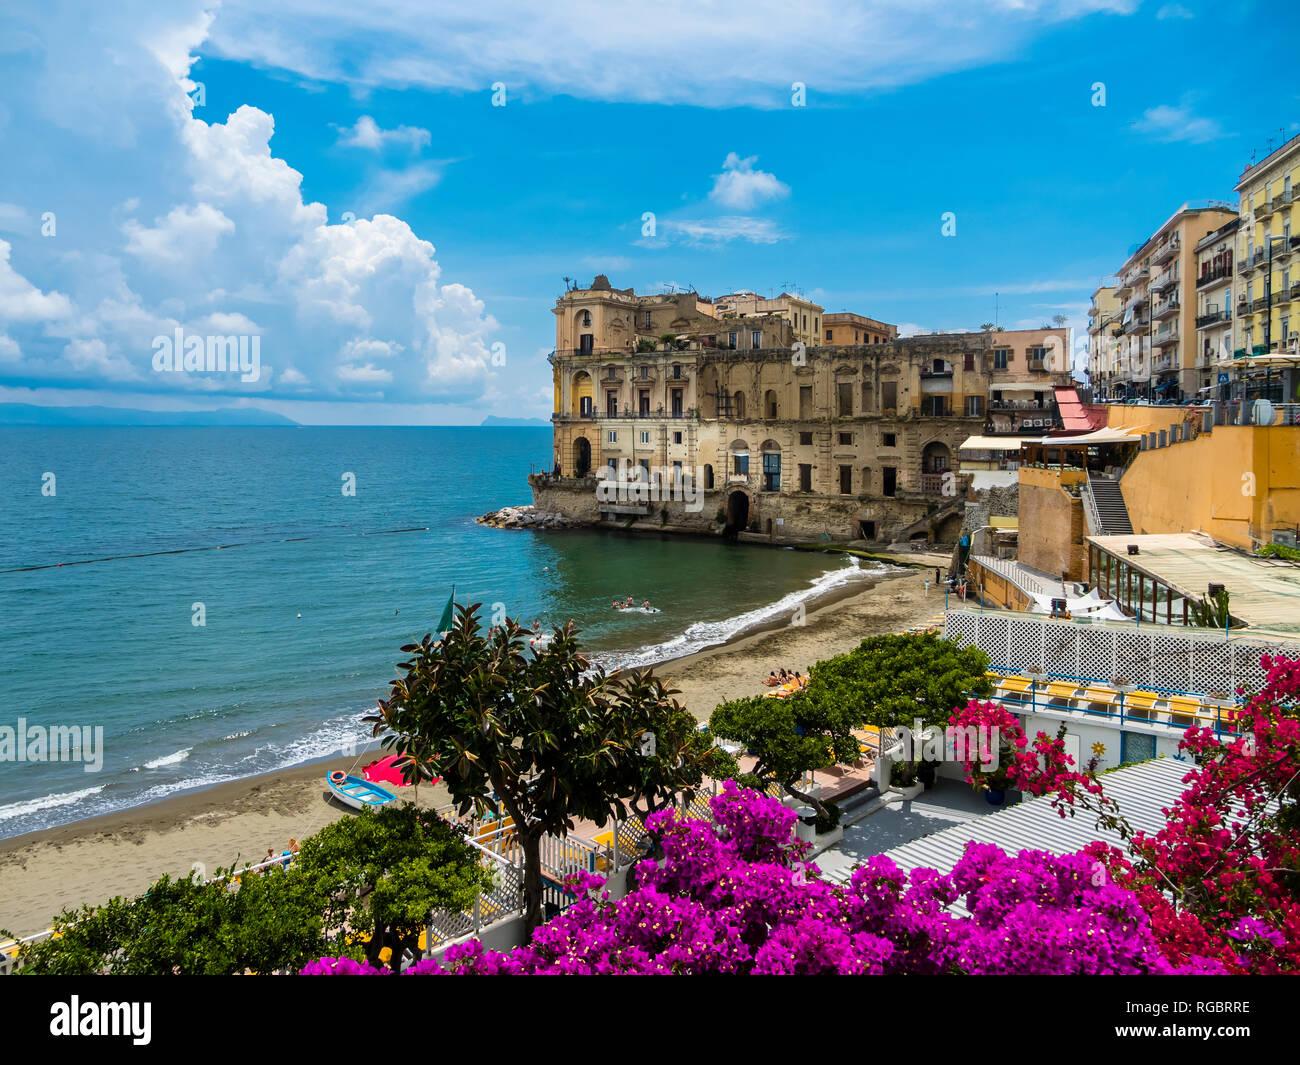 Italy, Campania, Neaples, Palazzo Donn'Anna, Gulf of Naples - Stock Image